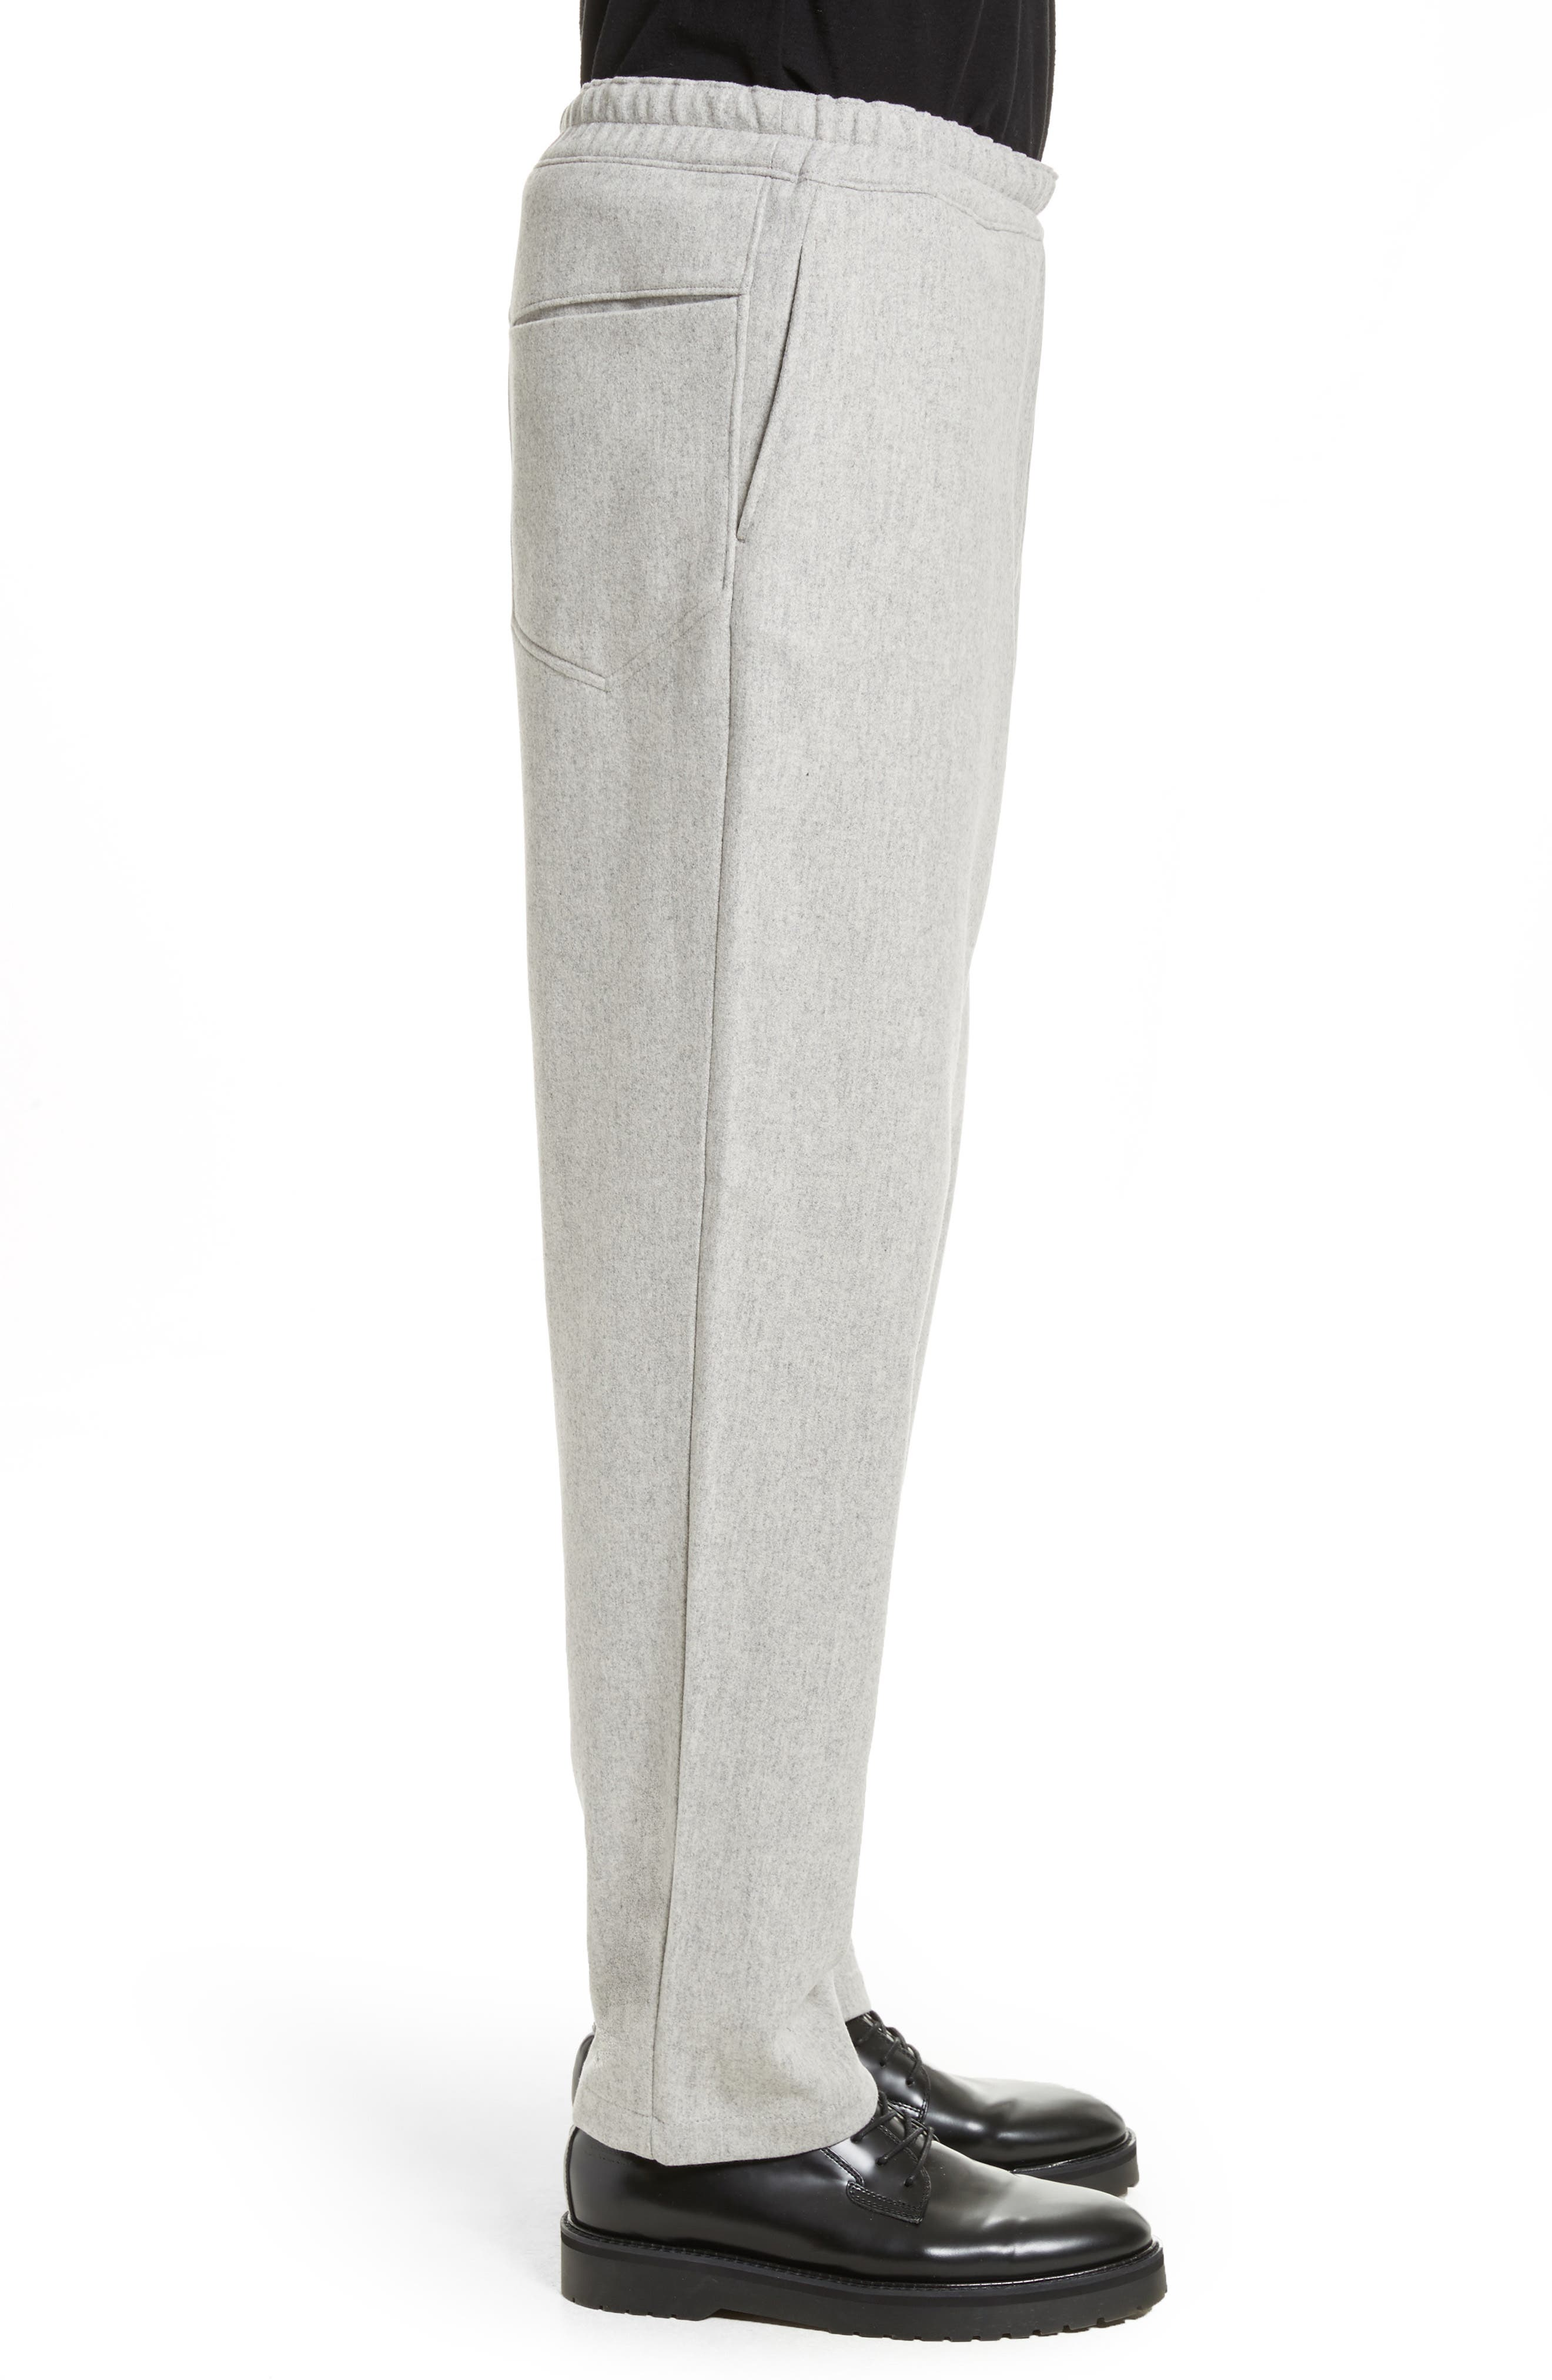 Mélange Wool Blend Trousers,                             Alternate thumbnail 3, color,                             Light Grey Melange